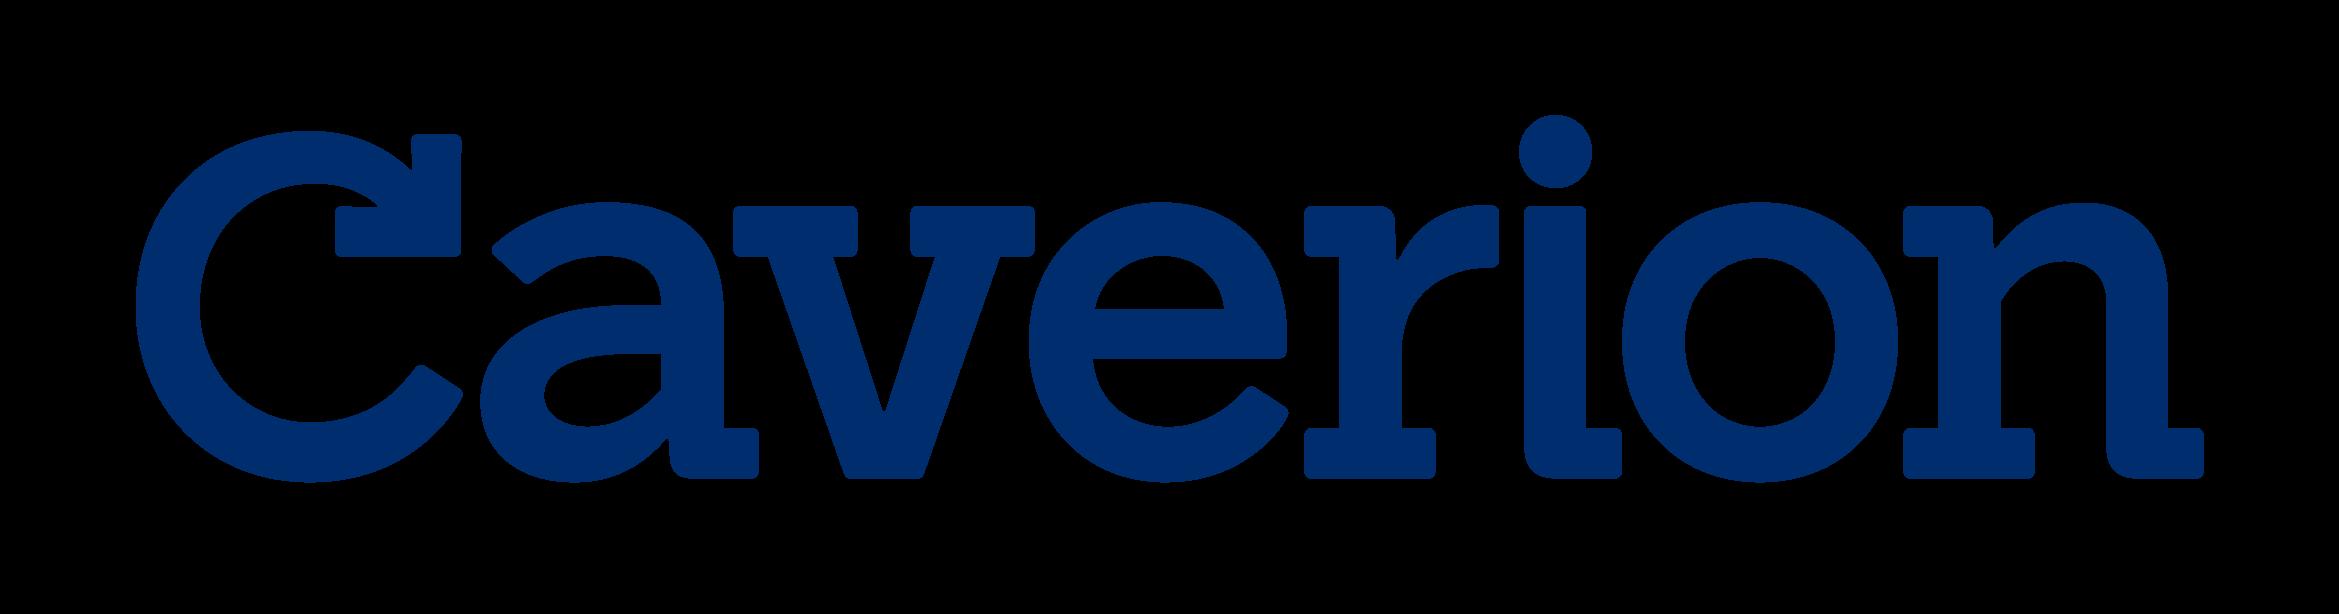 caverion logo blue large